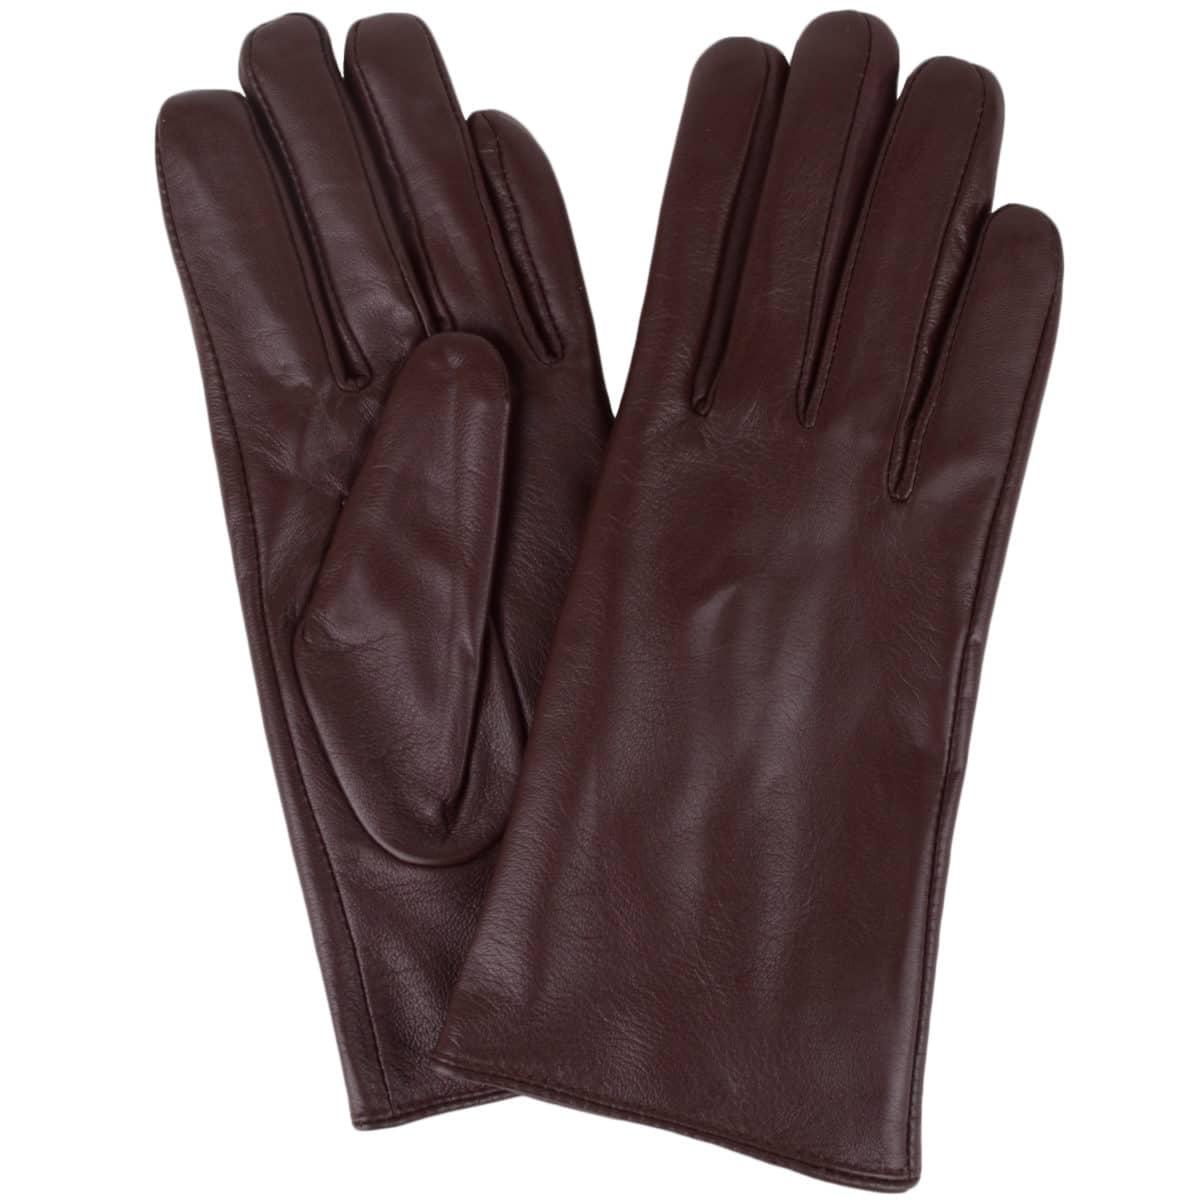 Tamara - Leather Gloves - Brown